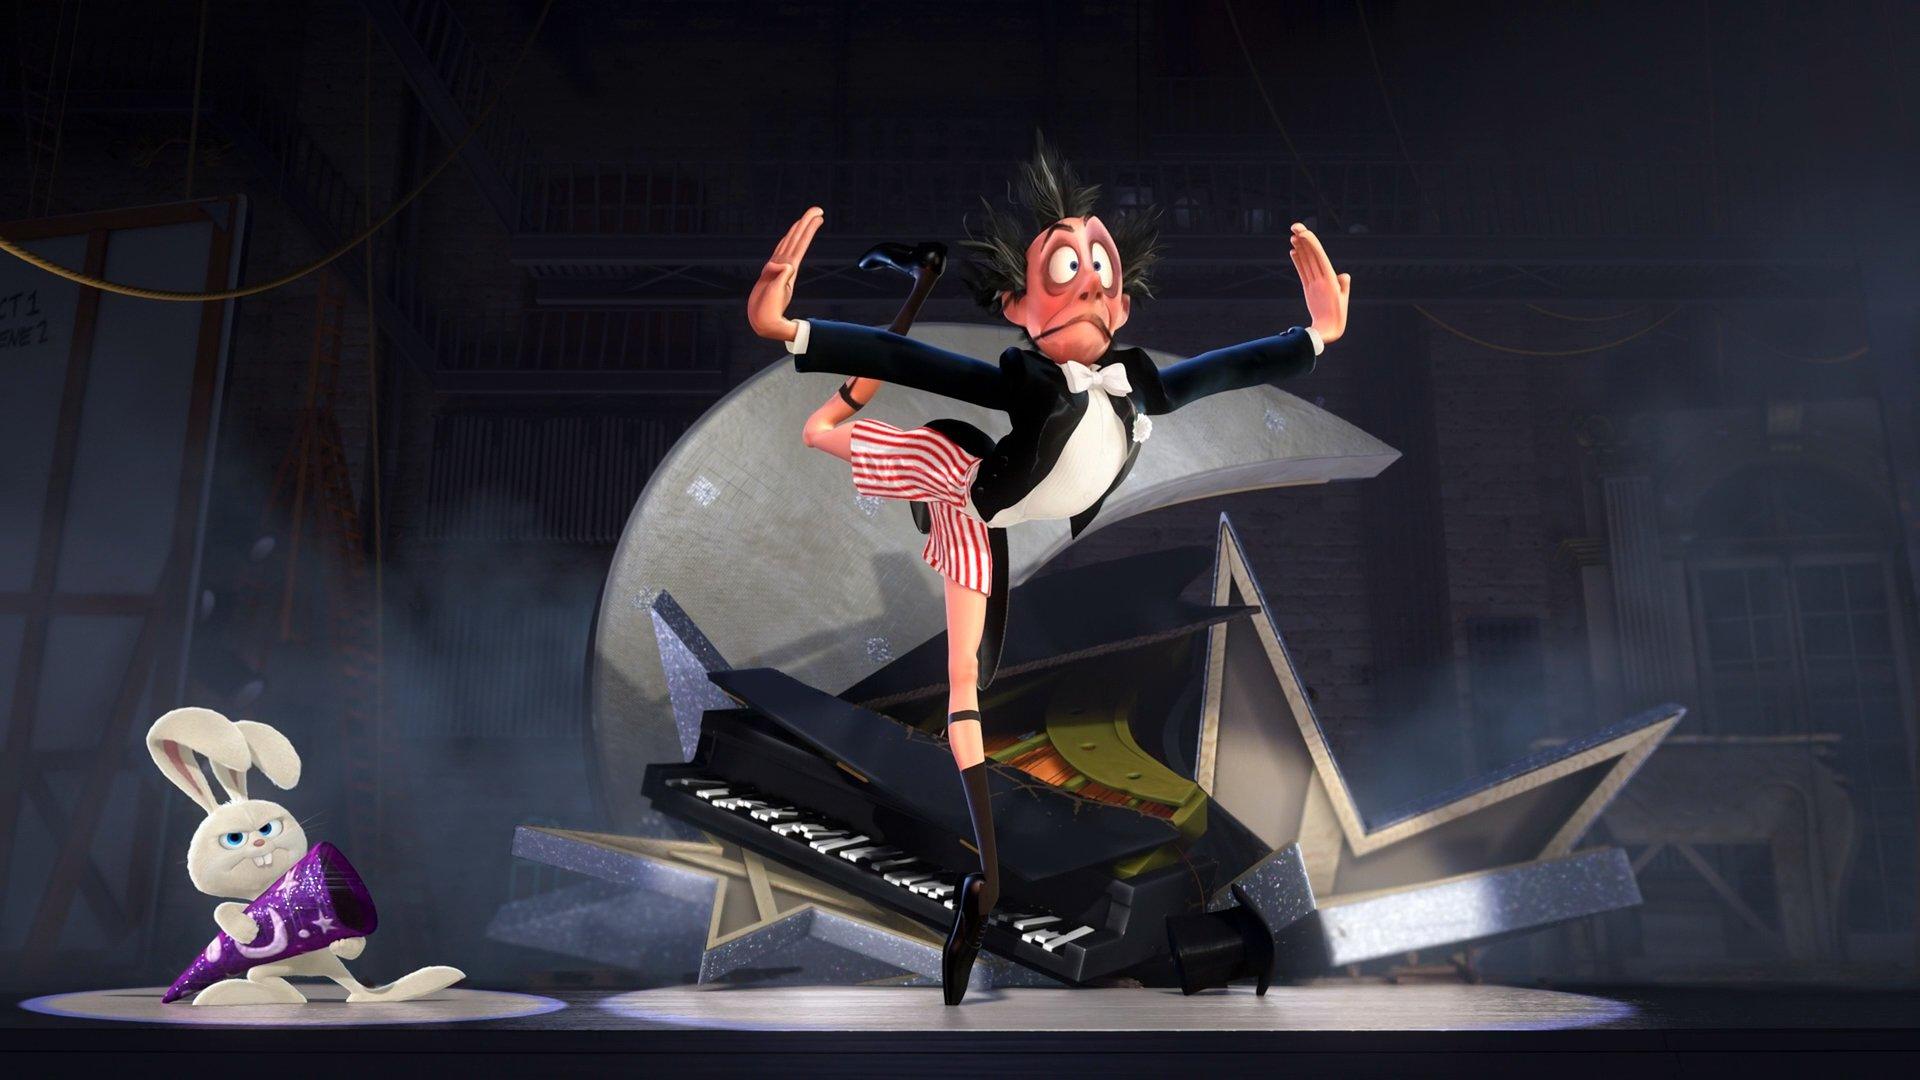 Cartoon - Pixar  Wallpaper